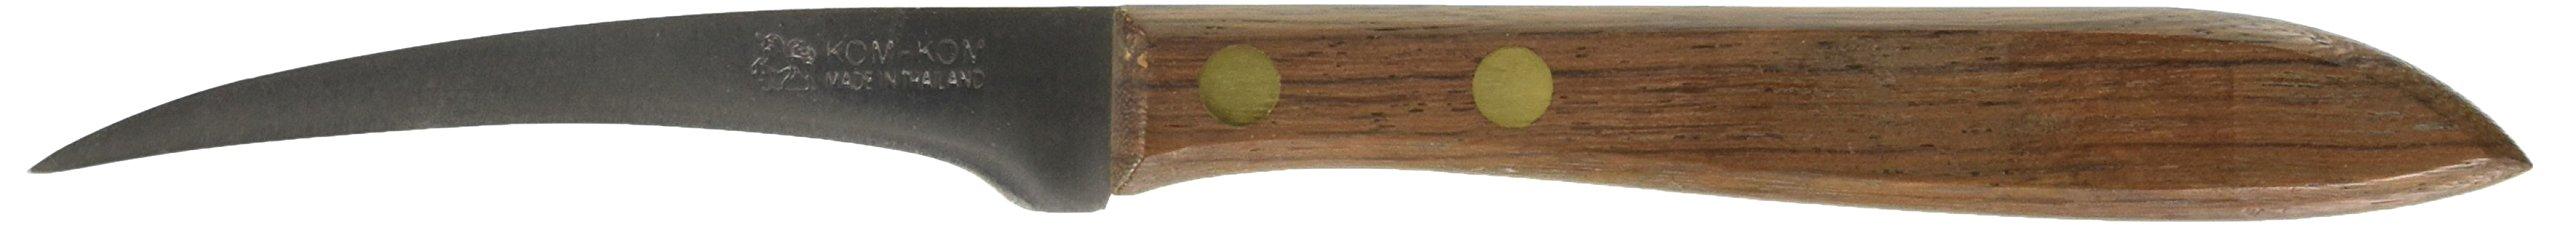 Fruit Carving Knife, 001A by Kom Kom (Image #1)